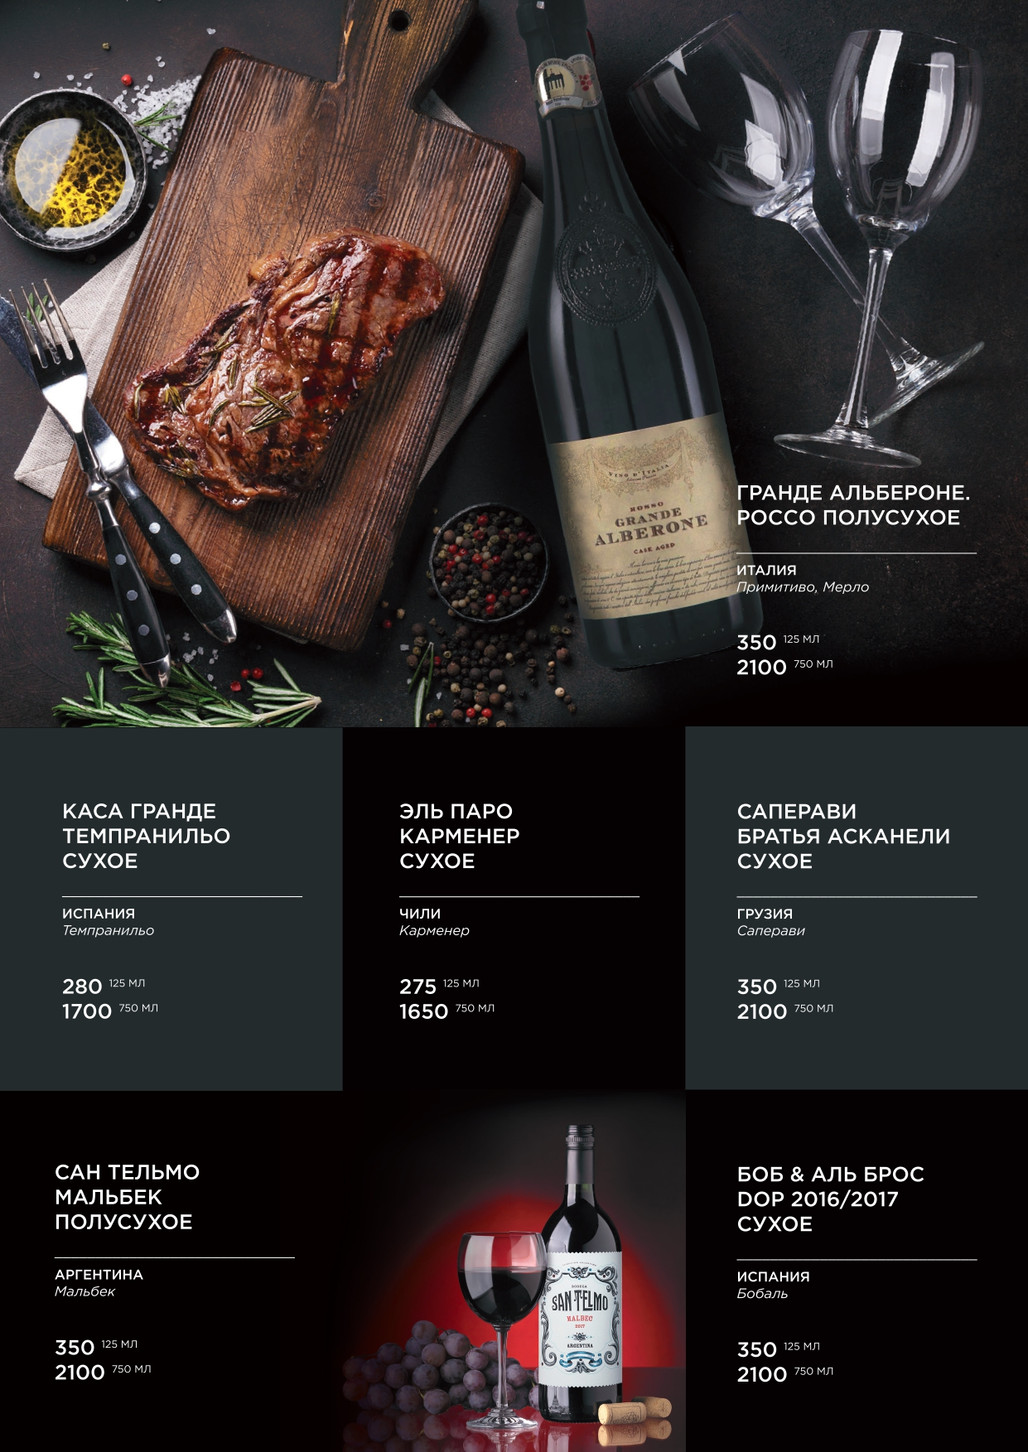 gastroli_wine_menu_print_page-0003.jpg